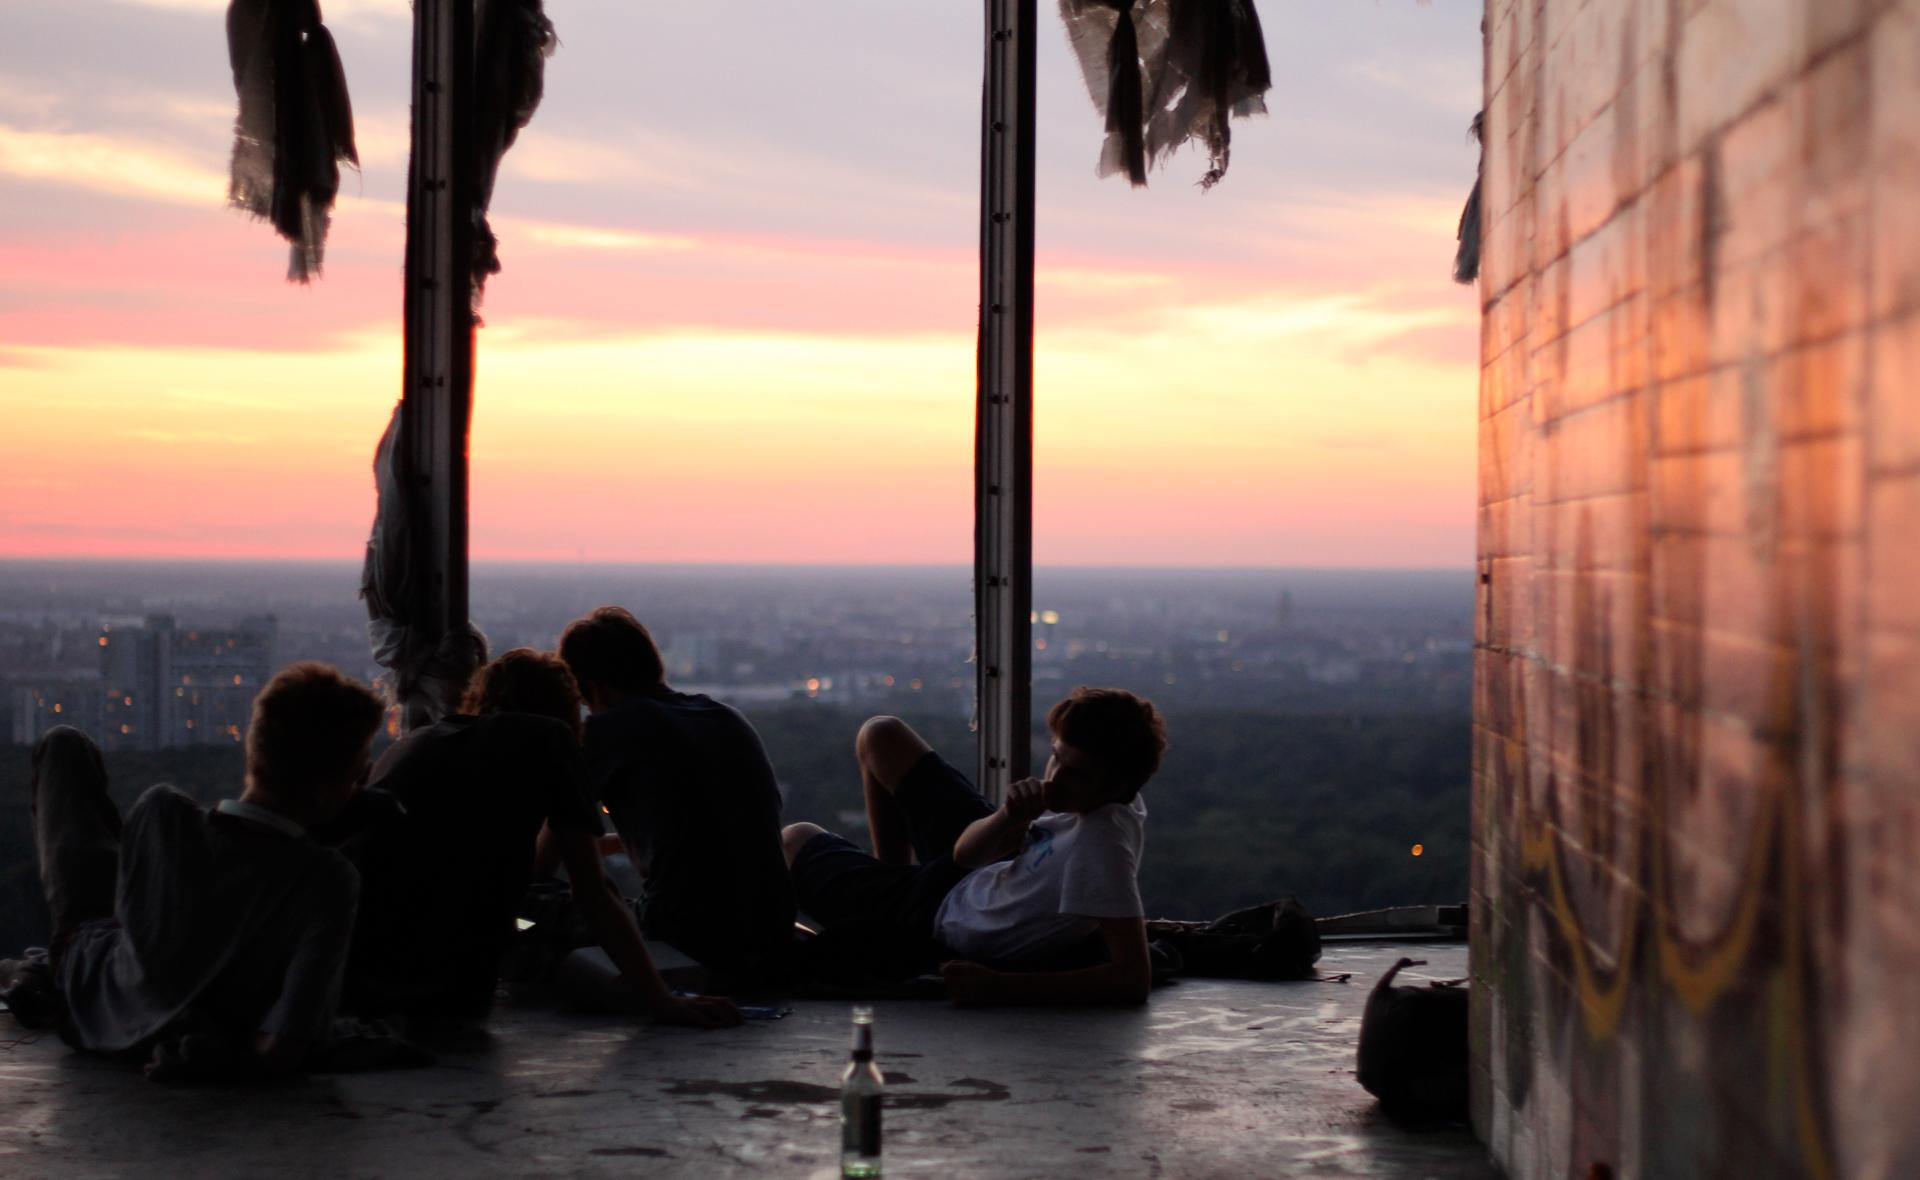 Tempelhofer Feld: Berlin's new outdoors sports complex